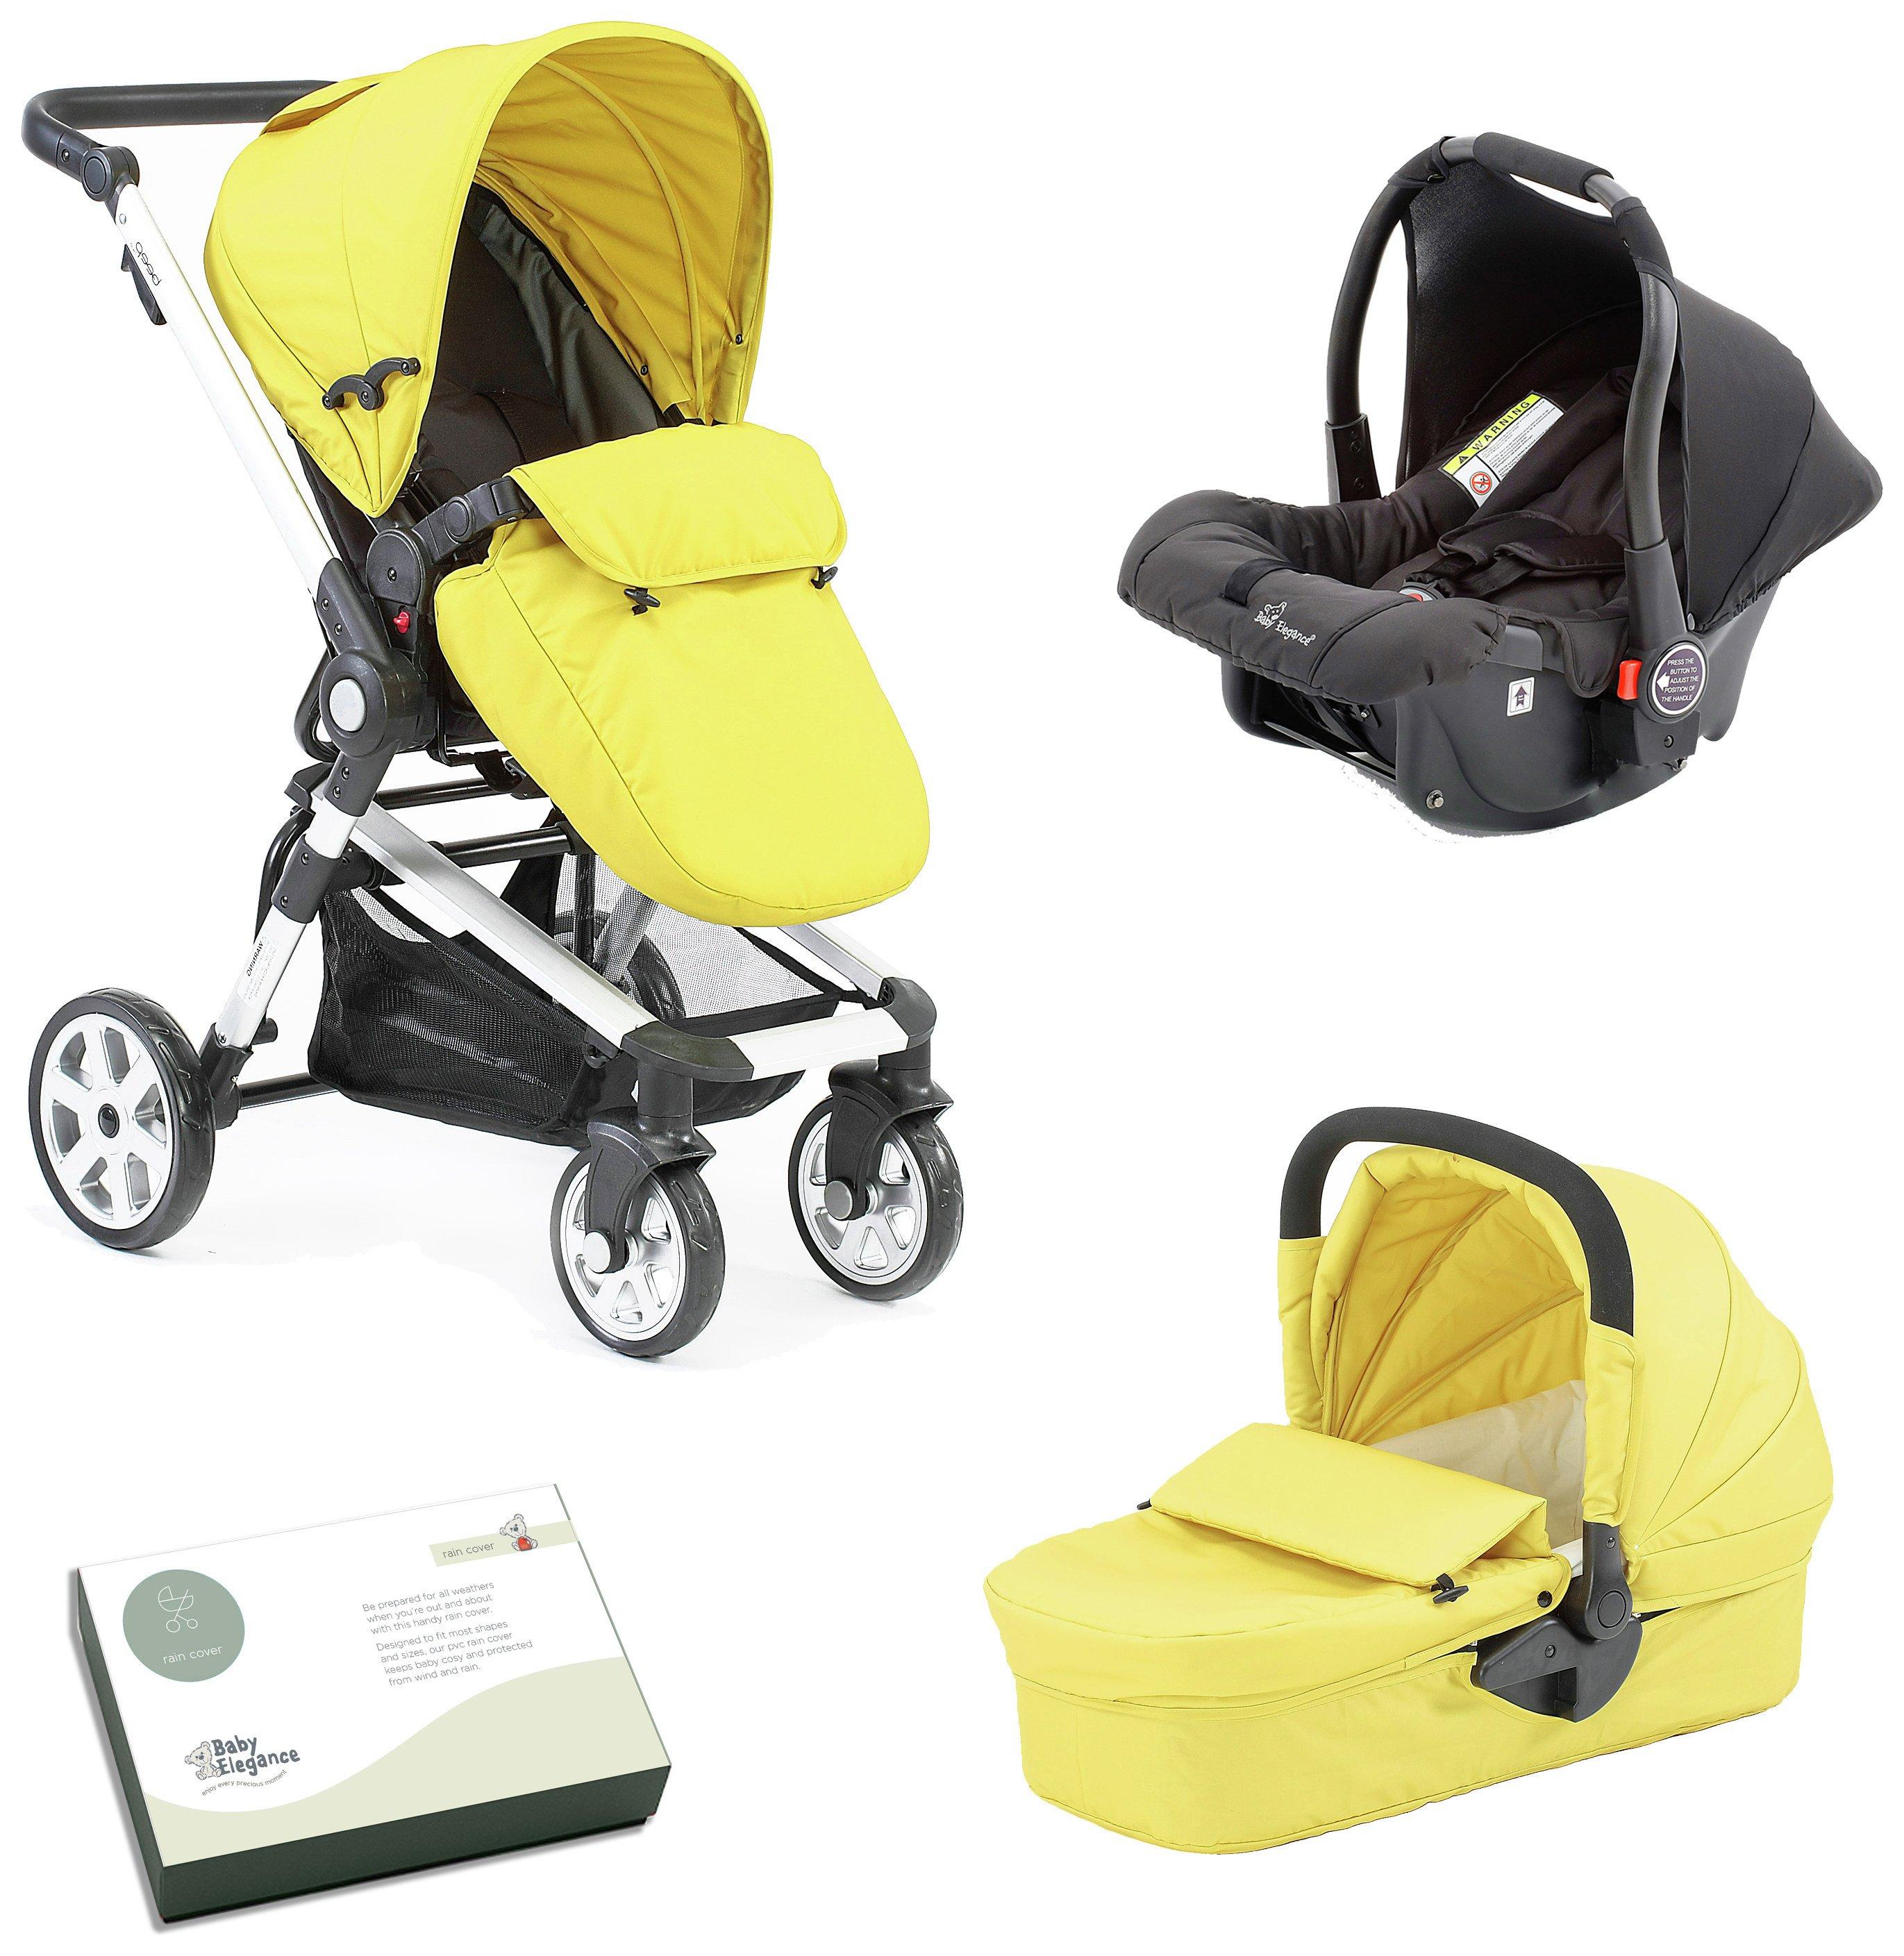 Image of Baby Elegance Beep Twist Travel System - Citrus.